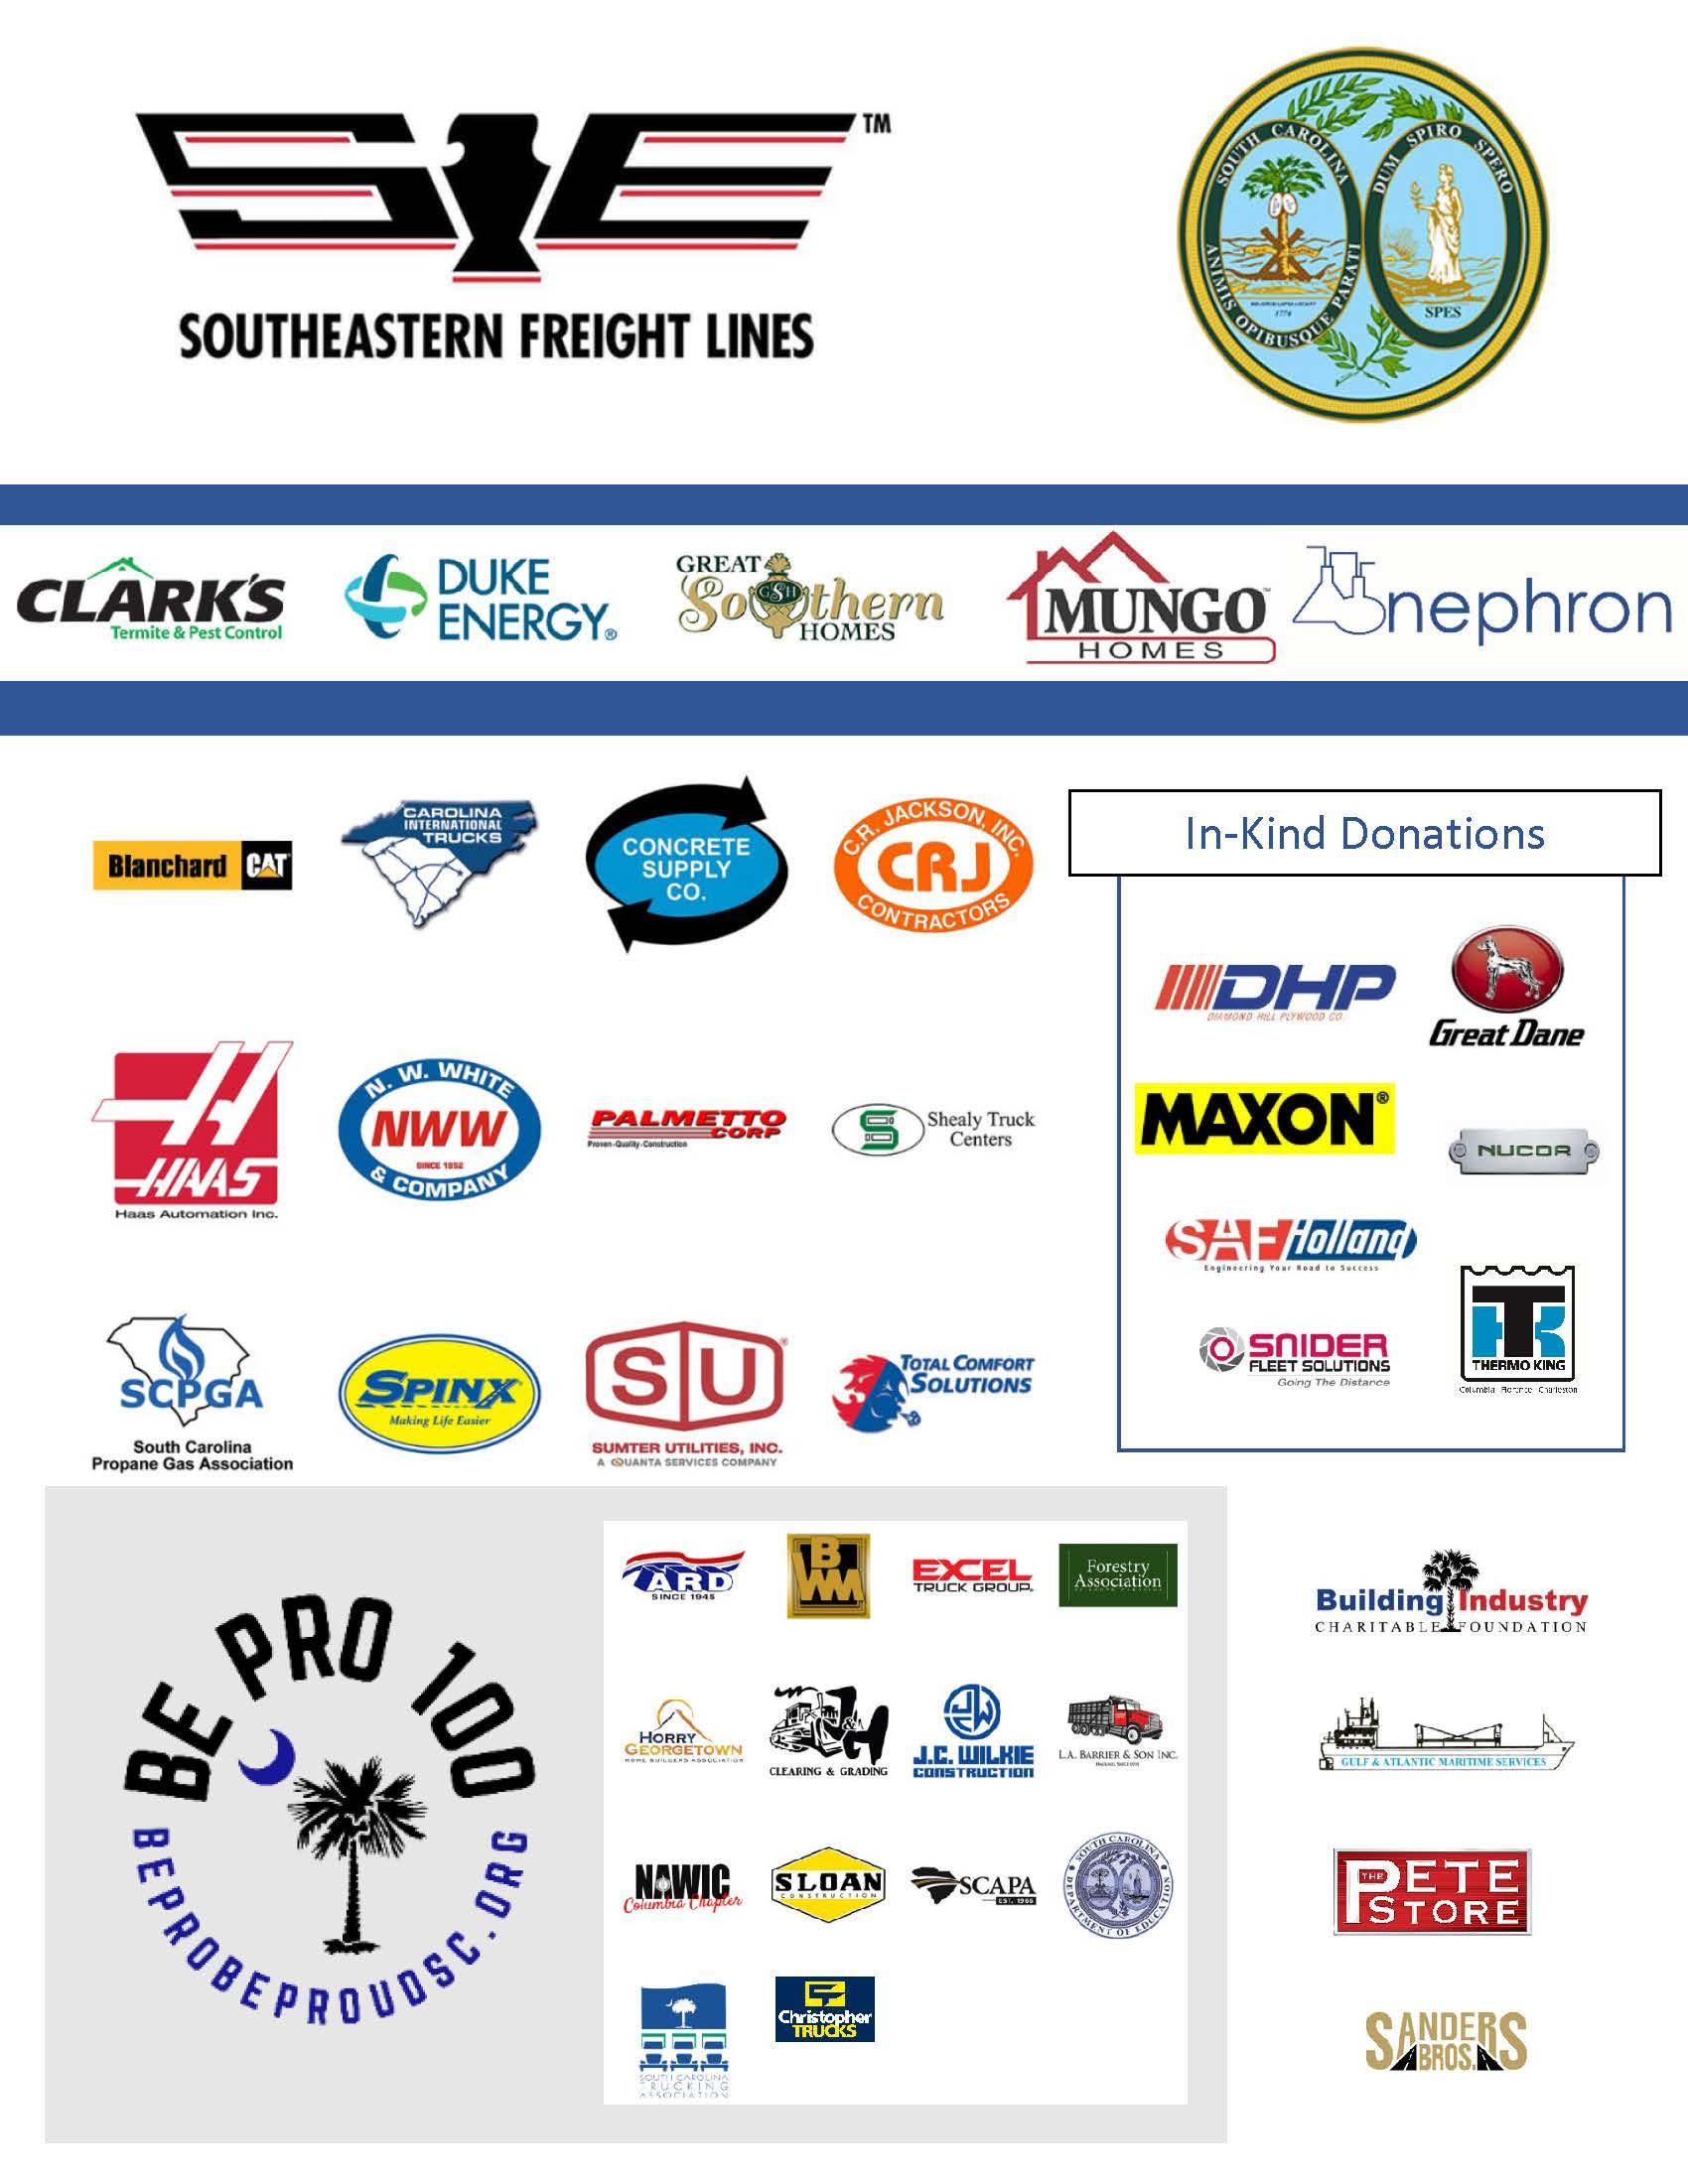 Aug 5 Sponsor logos